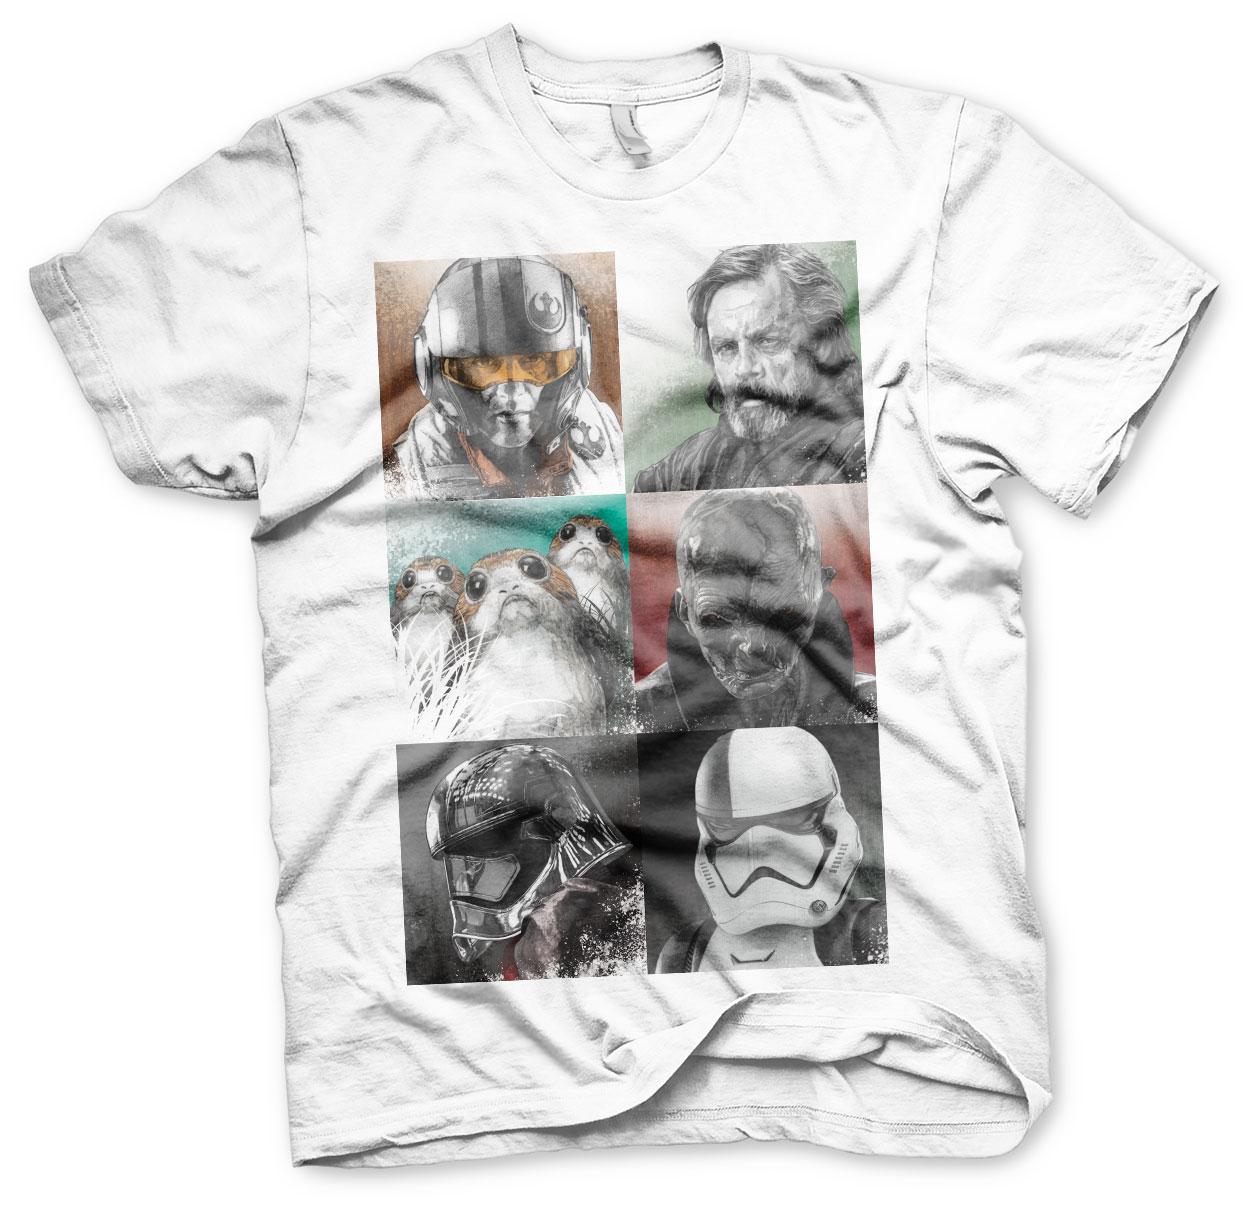 The Last Jedi Characters T-Shirt